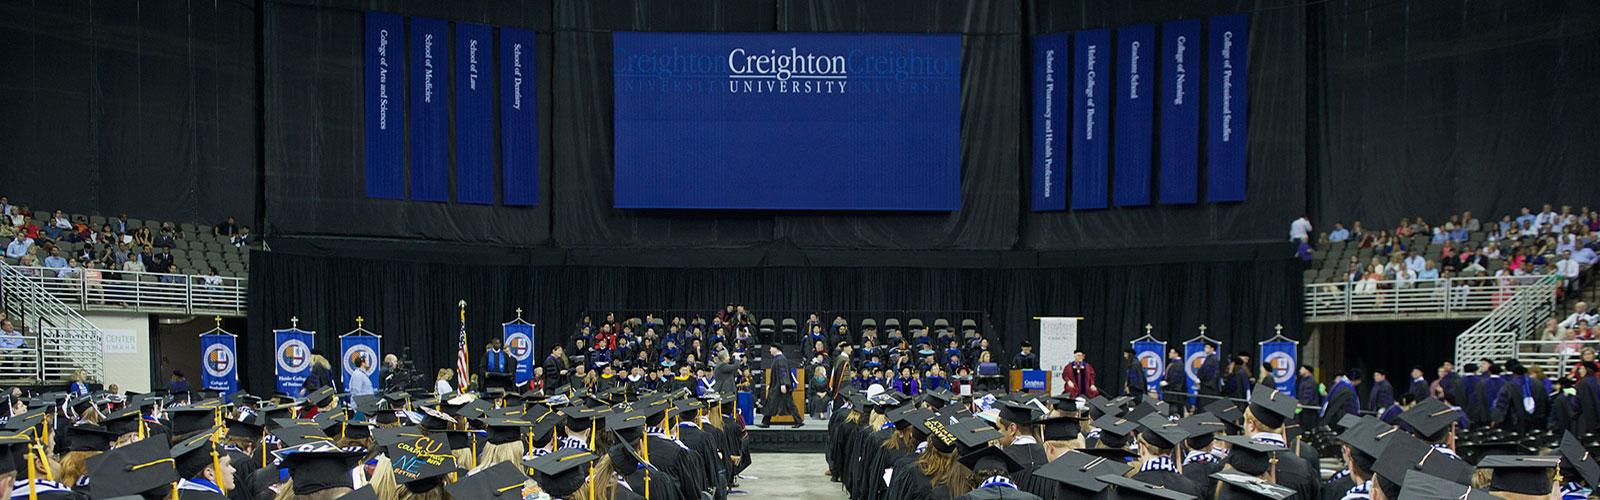 Creighton University Graduation